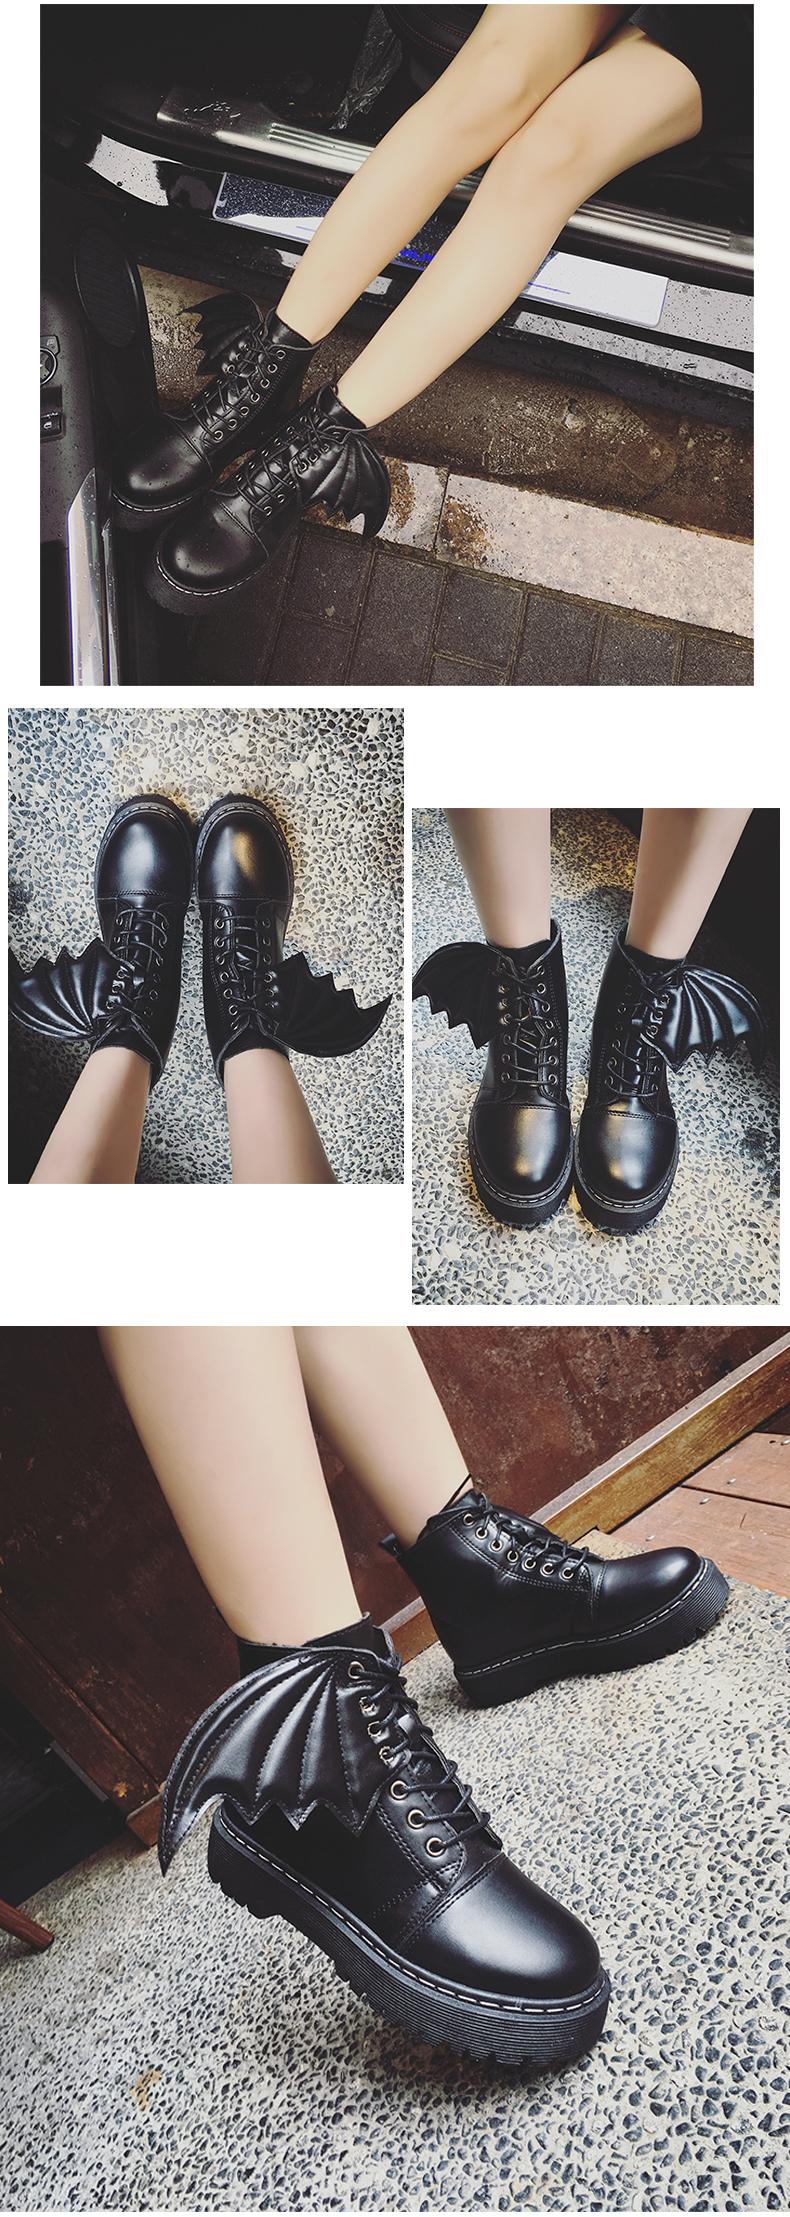 rebelsmarket_devil_wings_boots_botas_alas_demonio_wh398_boots_3.jpg